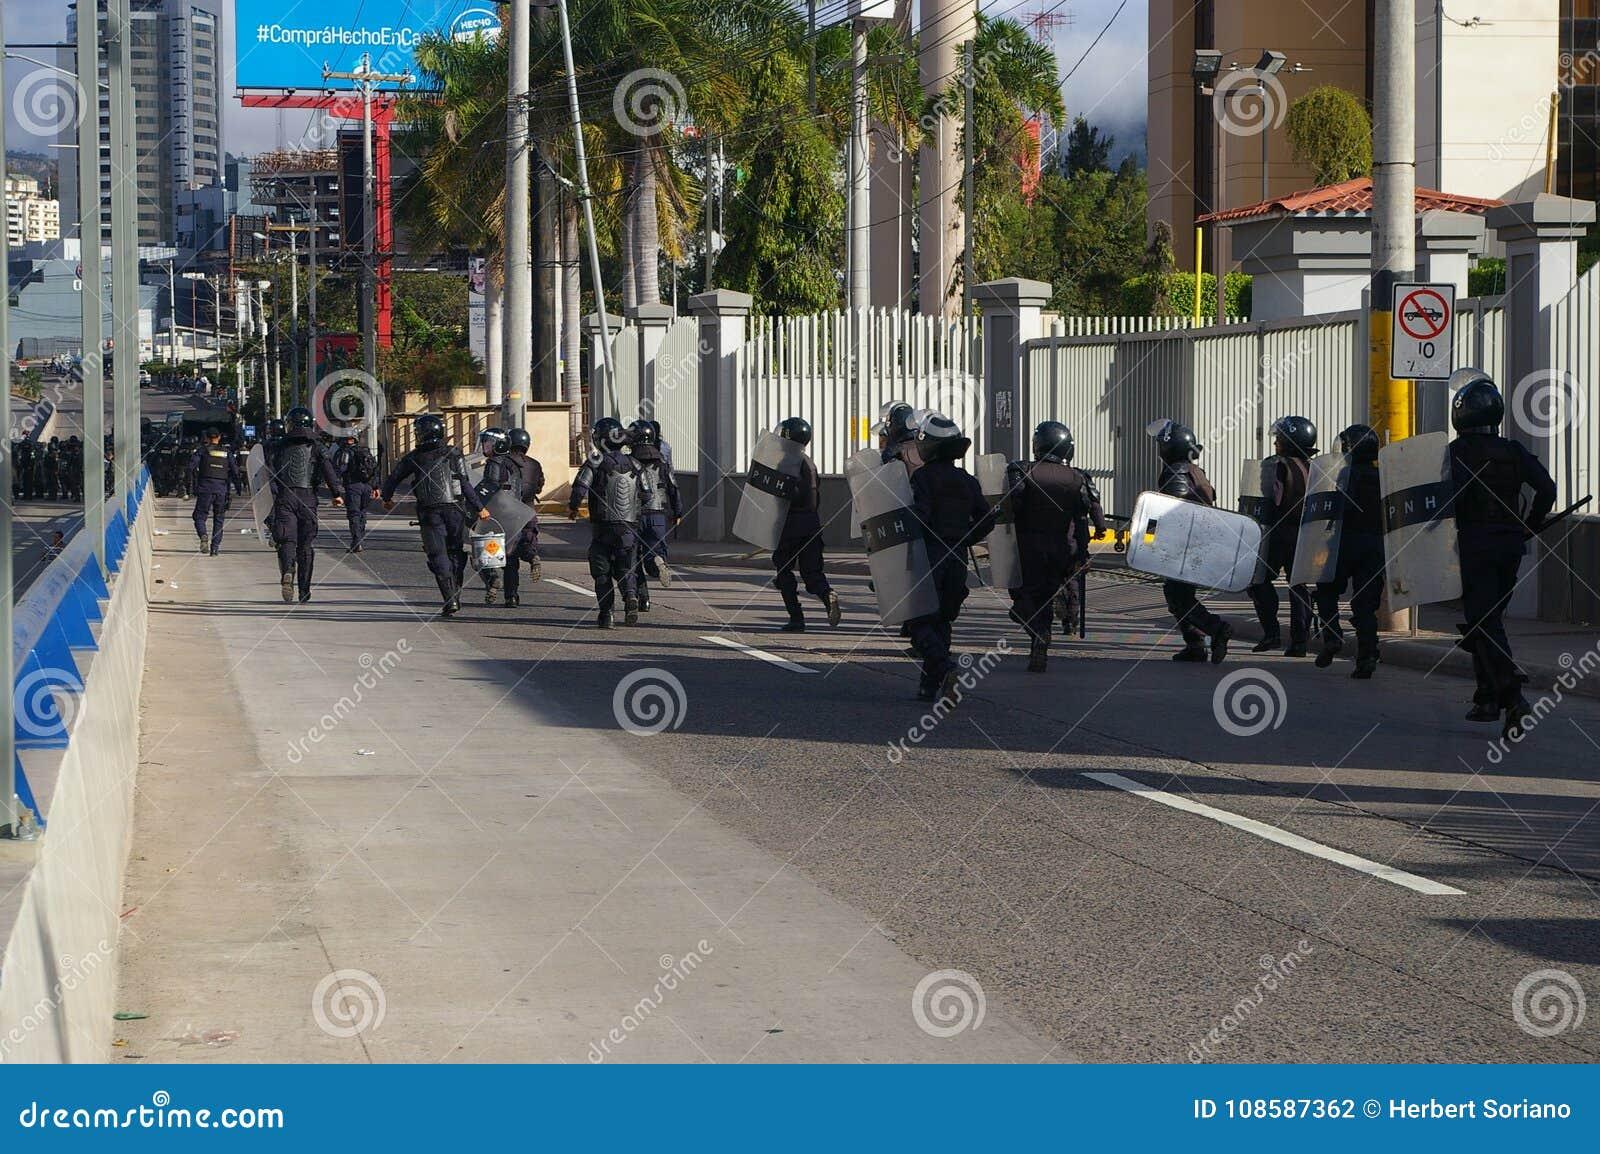 Le Honduras protestation march en janvier 2018 Tegucigalpa, Honduras 5